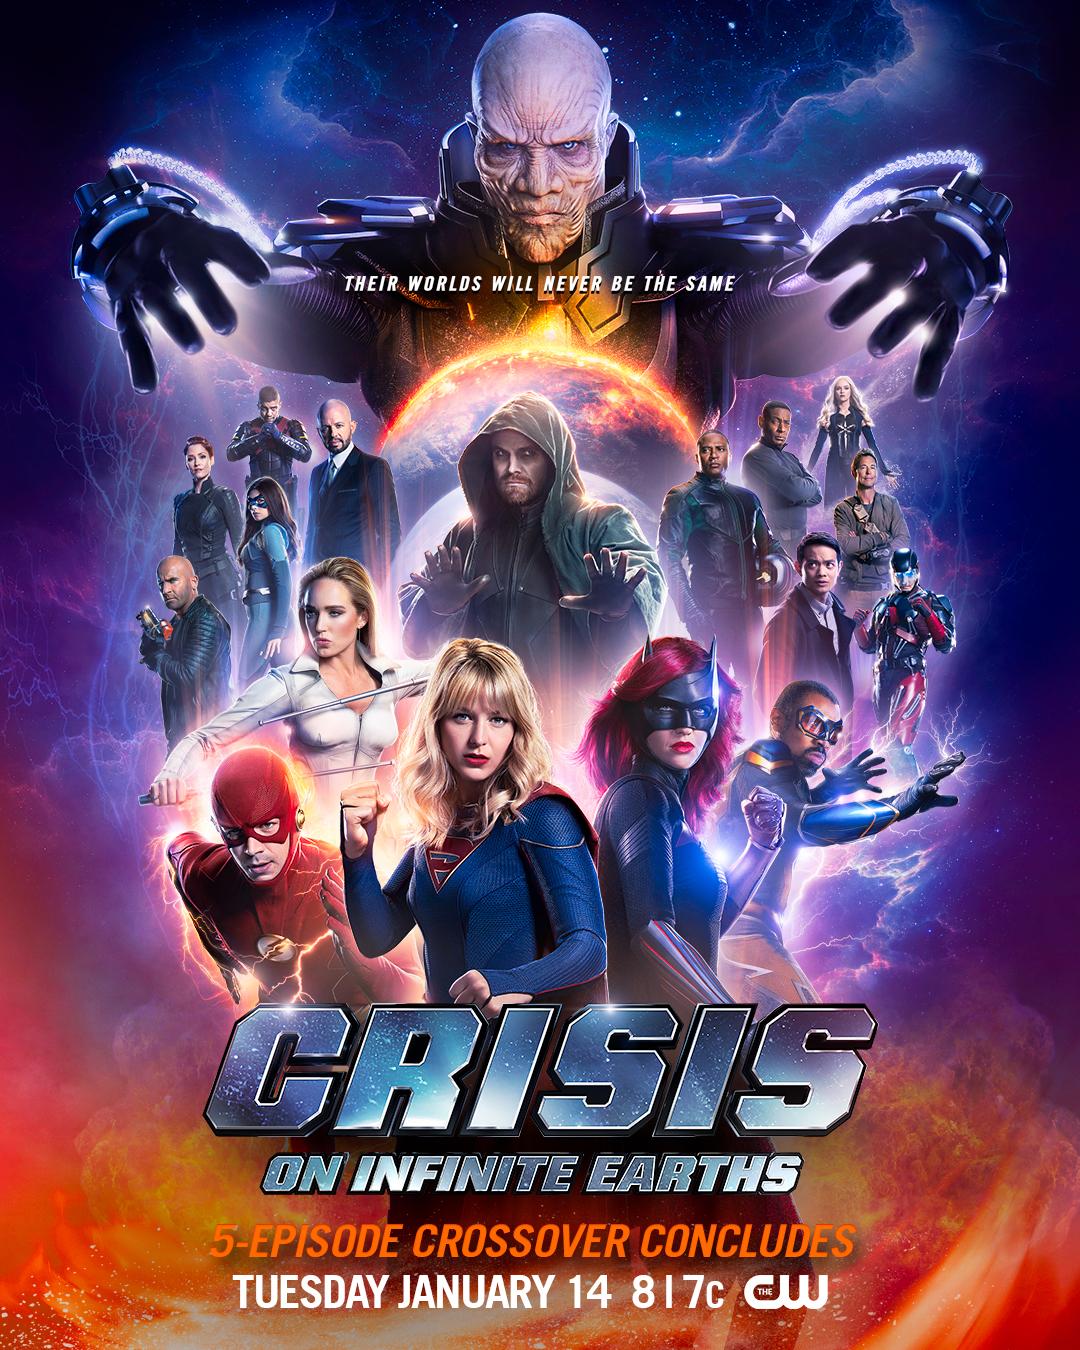 Póster de los episodios finales de Crisis on Infinite Earths. Imagen: Supergirl Twitter (@TheCWSupergirl).